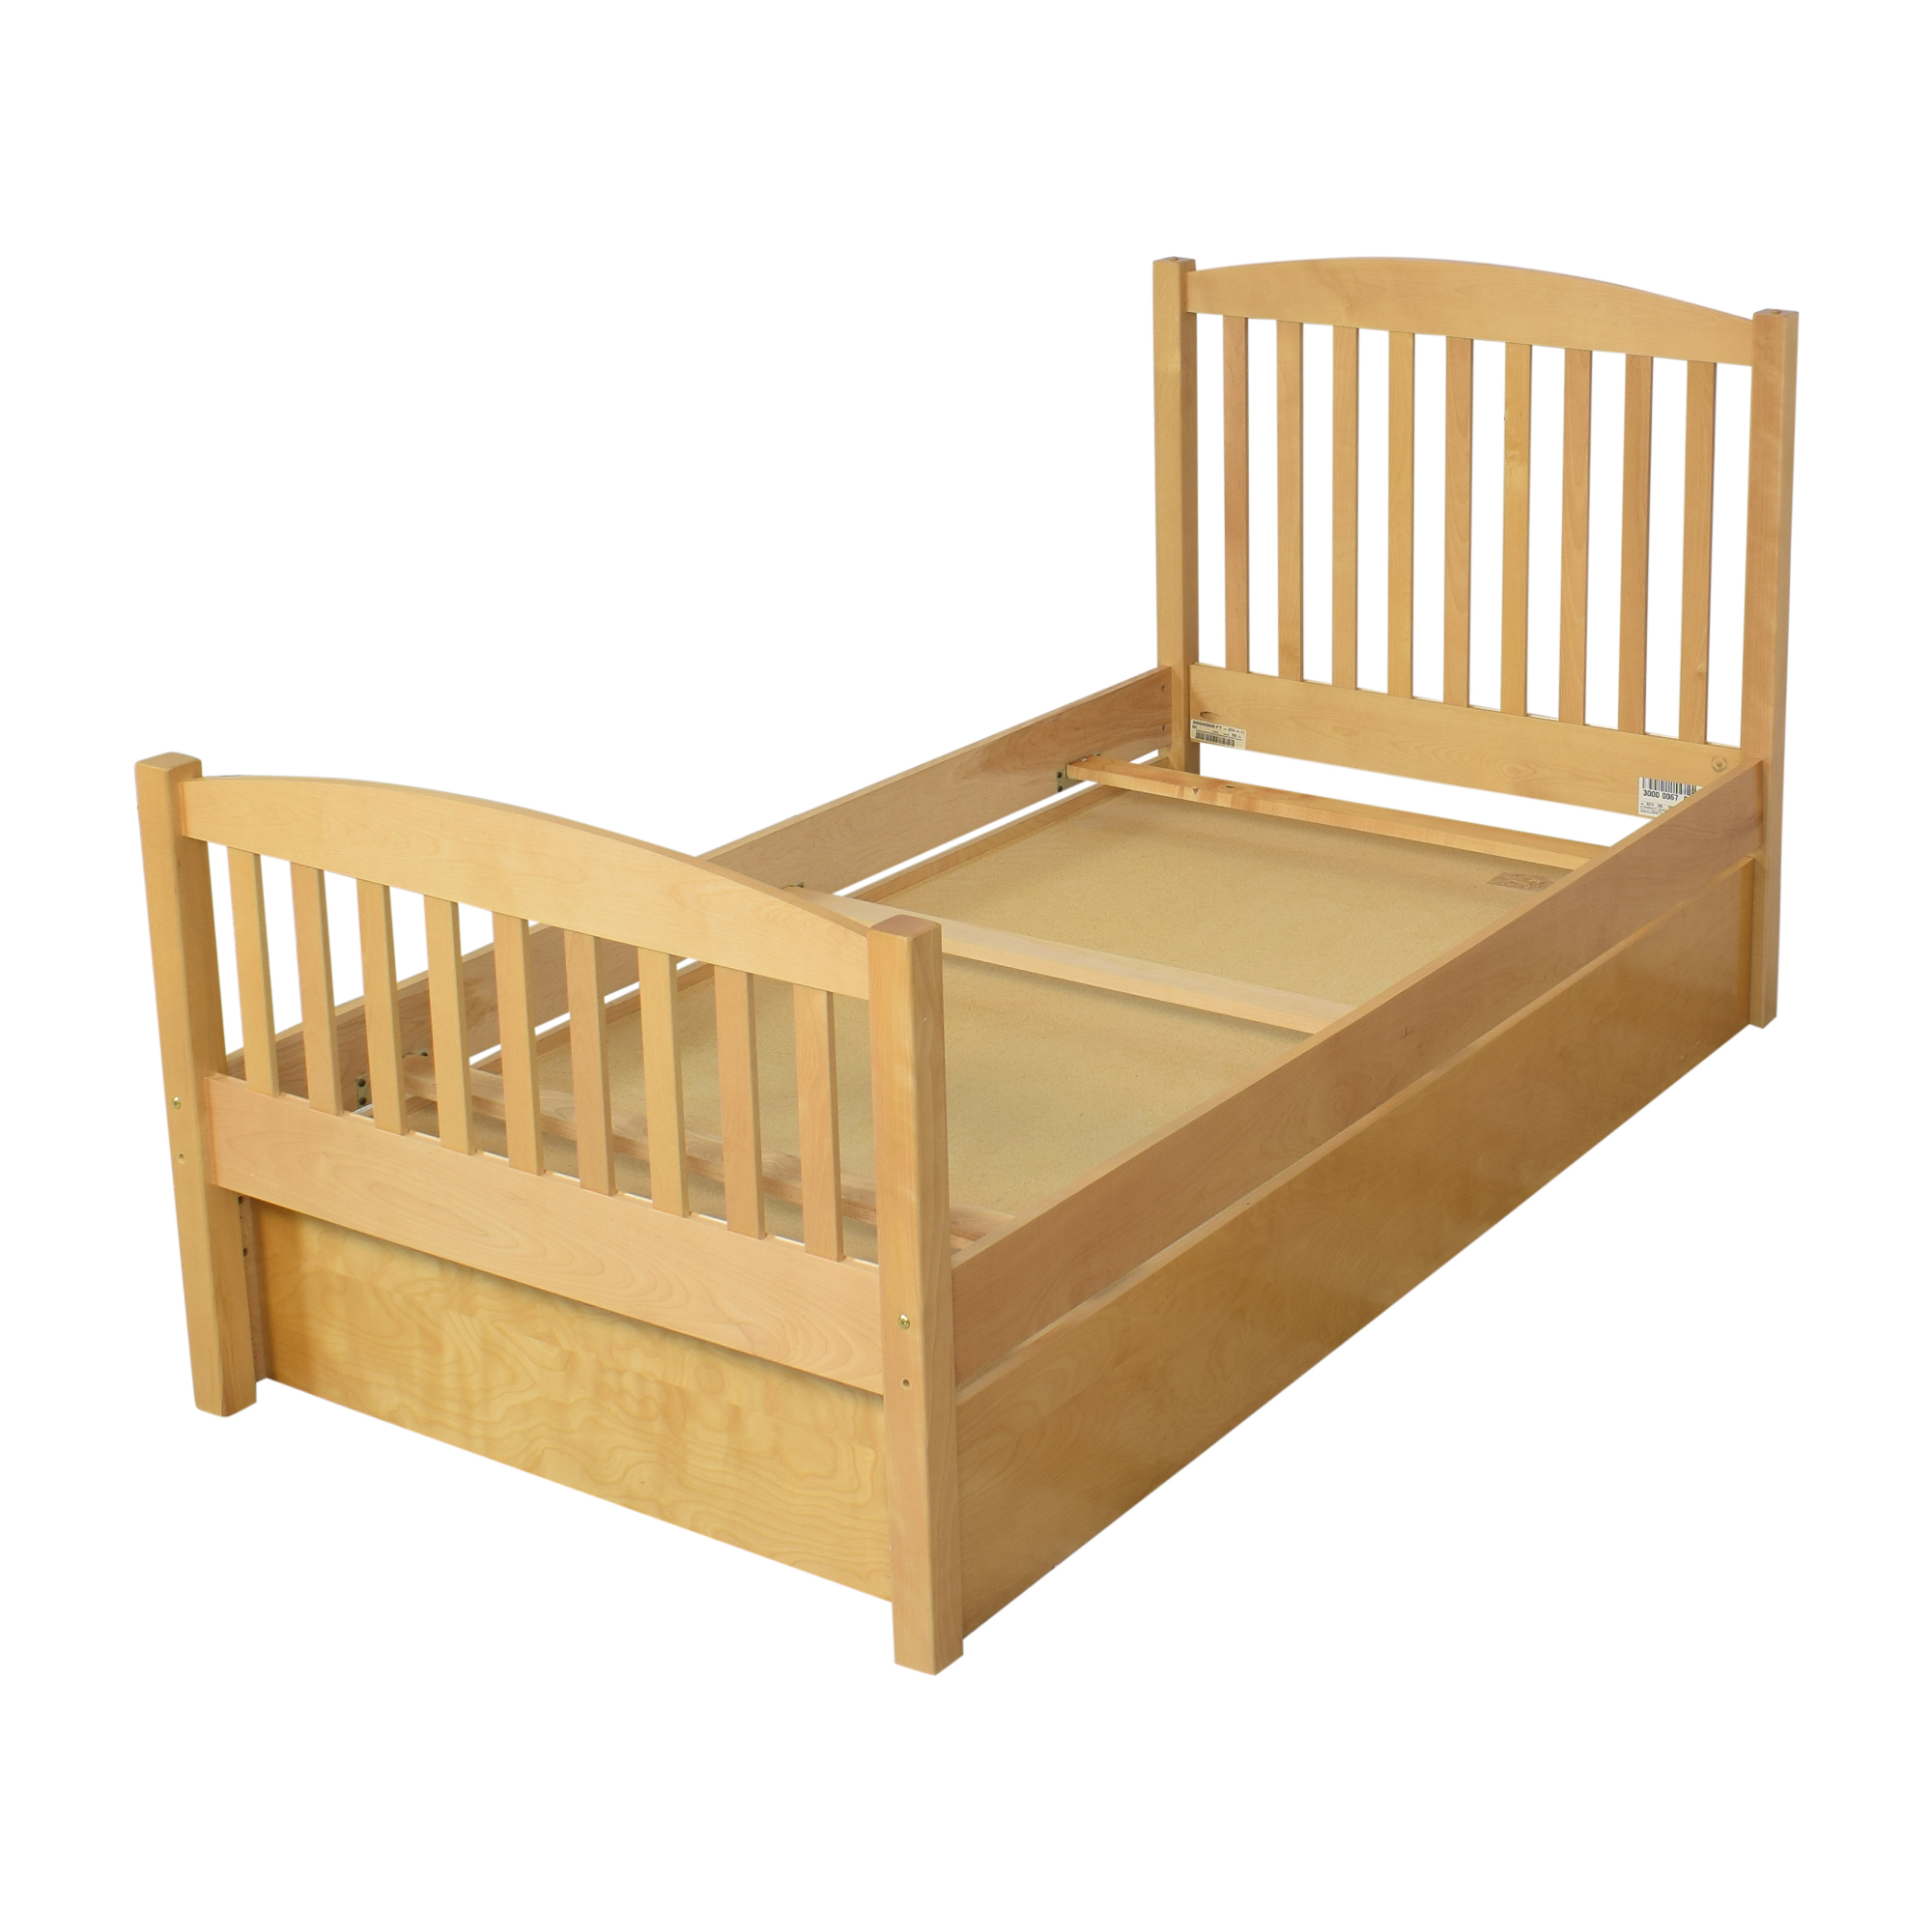 AP Industries AP Industries Twin Bed with Storage nj